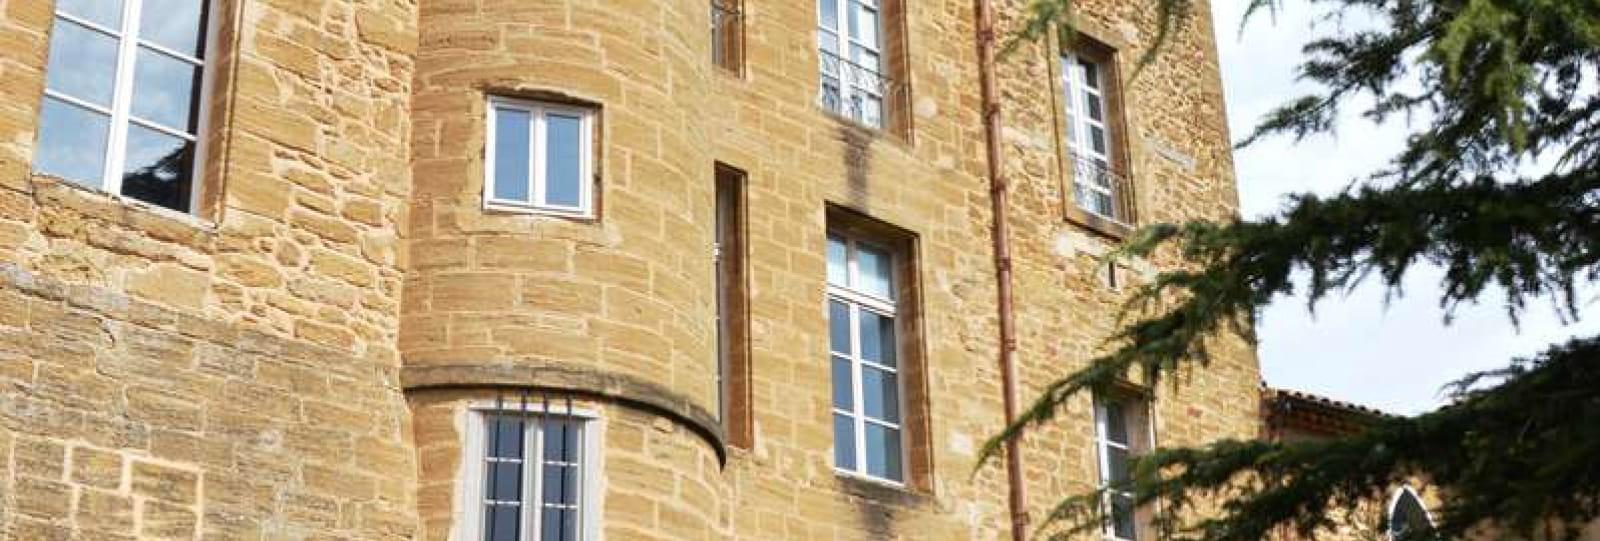 Echappée prestige - Drôme Sud Provence